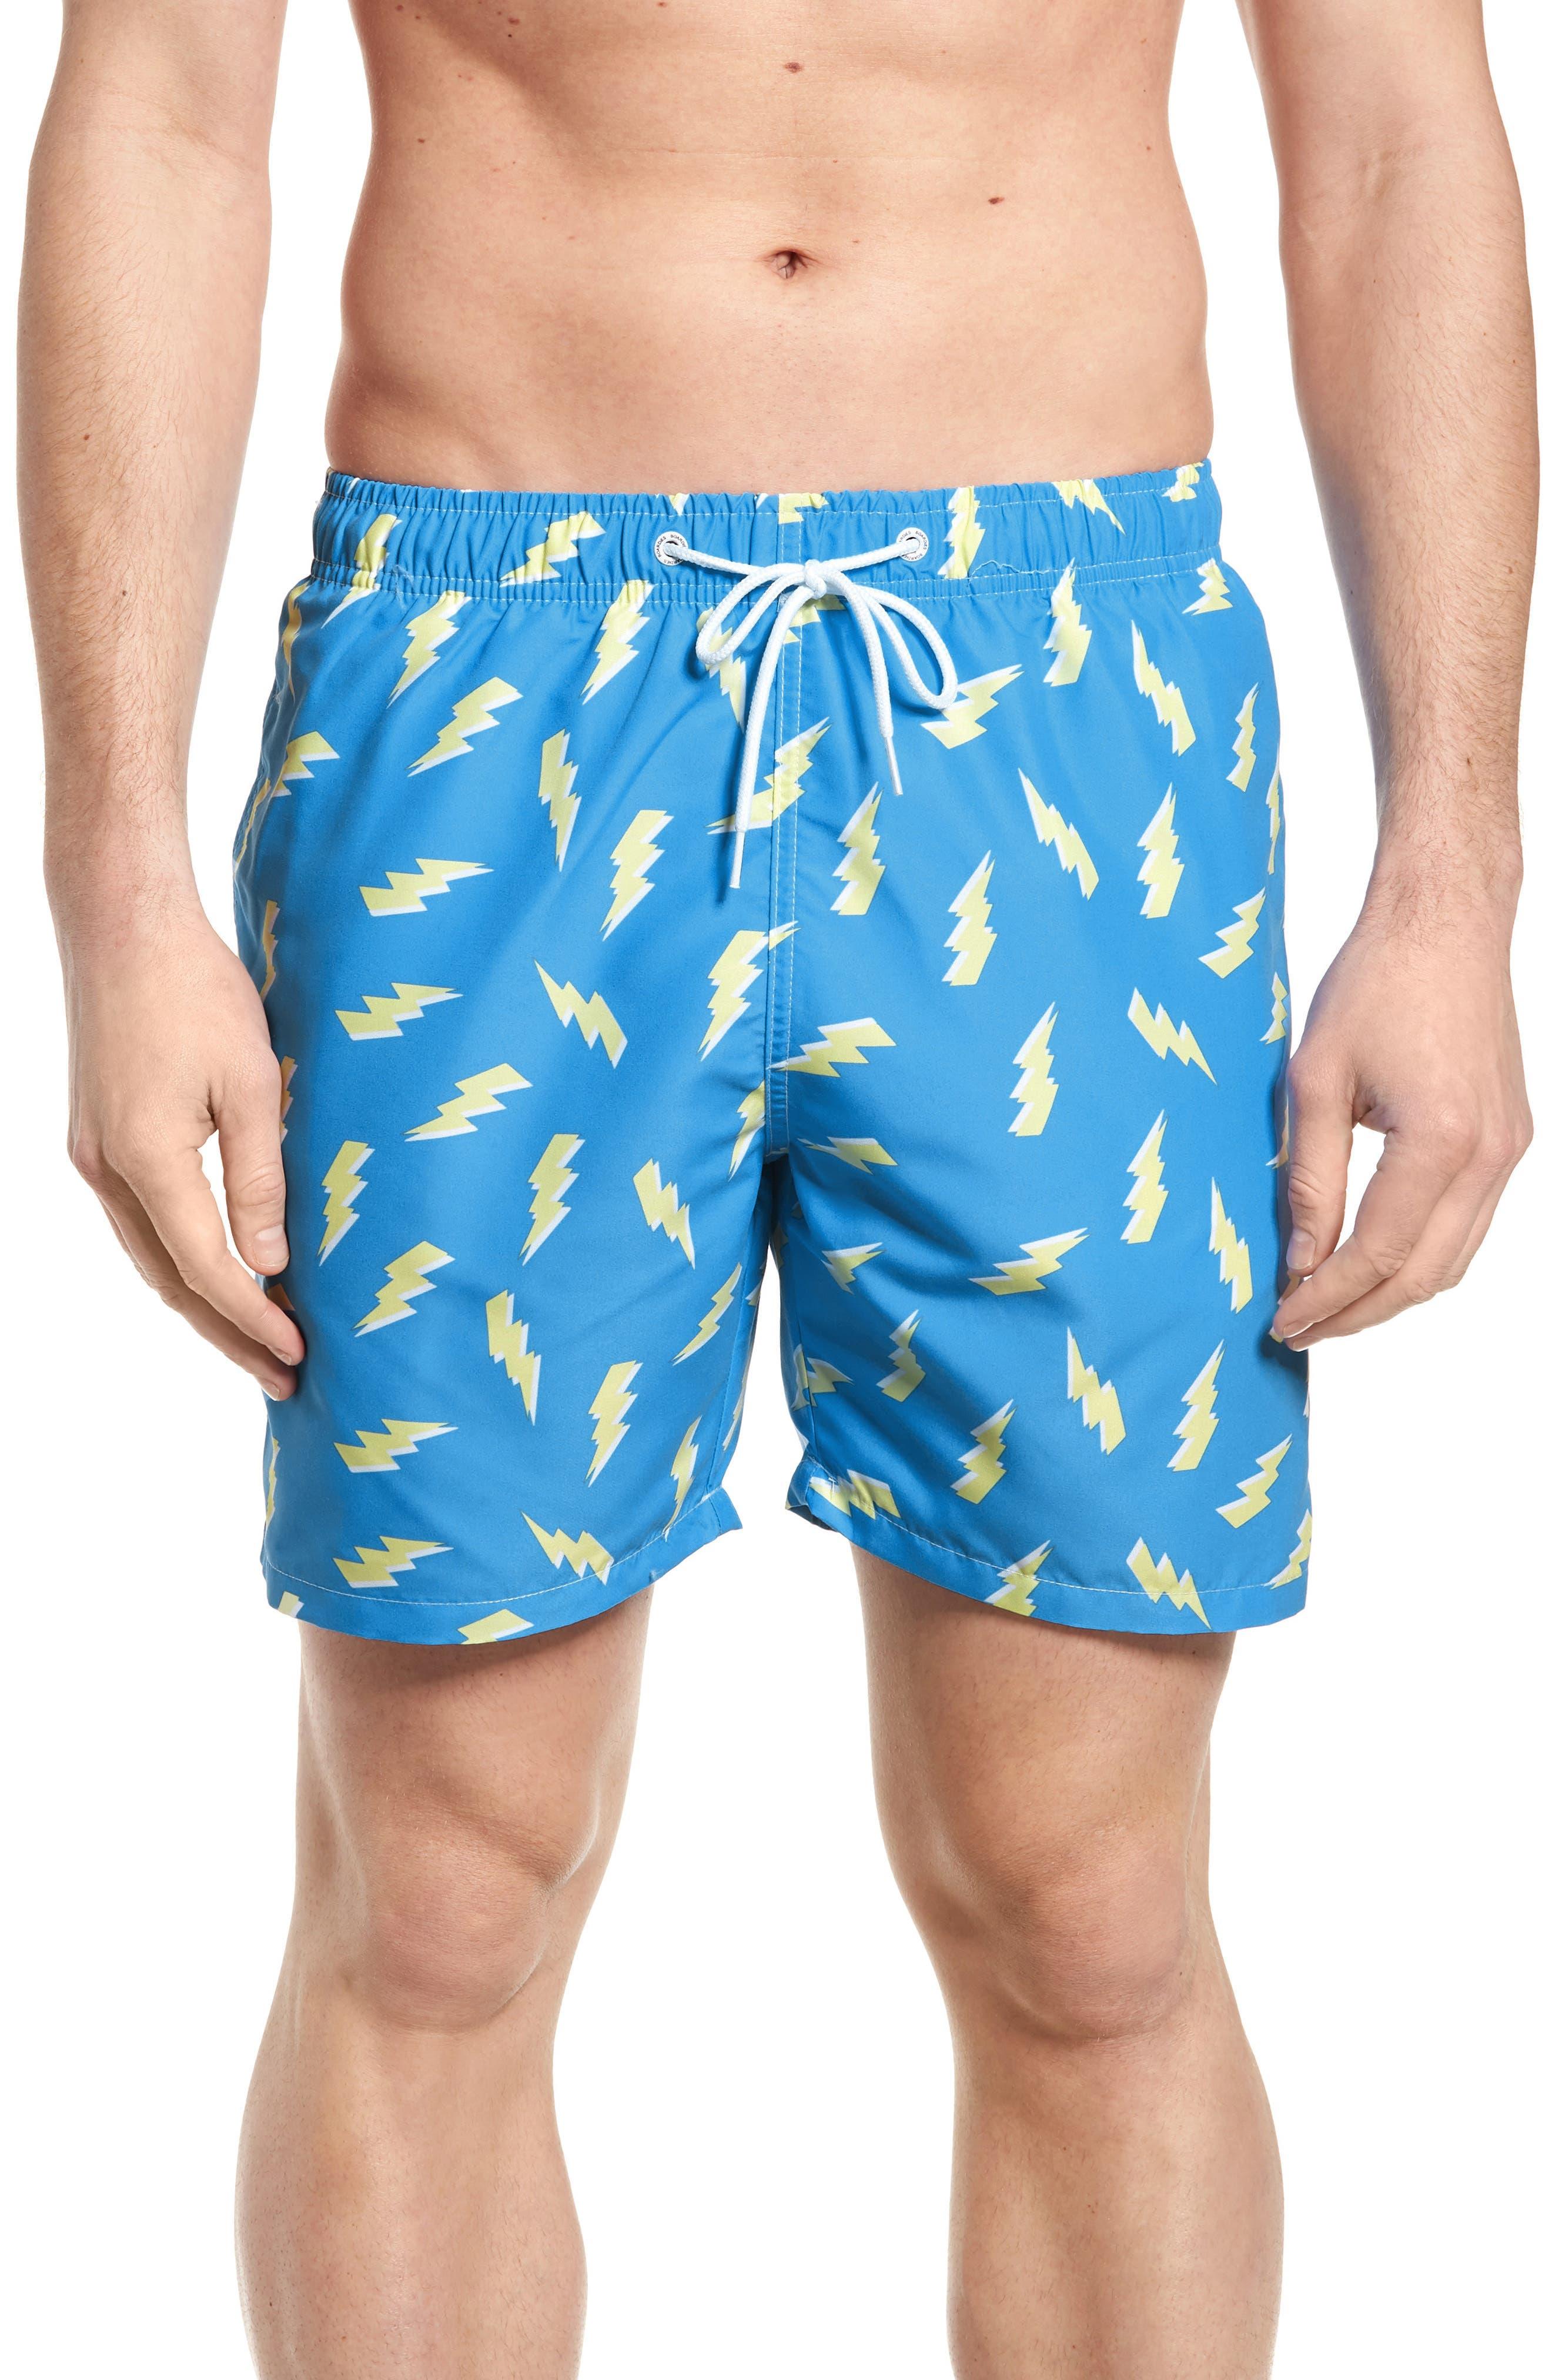 Zaps Print Swim Trunks,                         Main,                         color, Blue